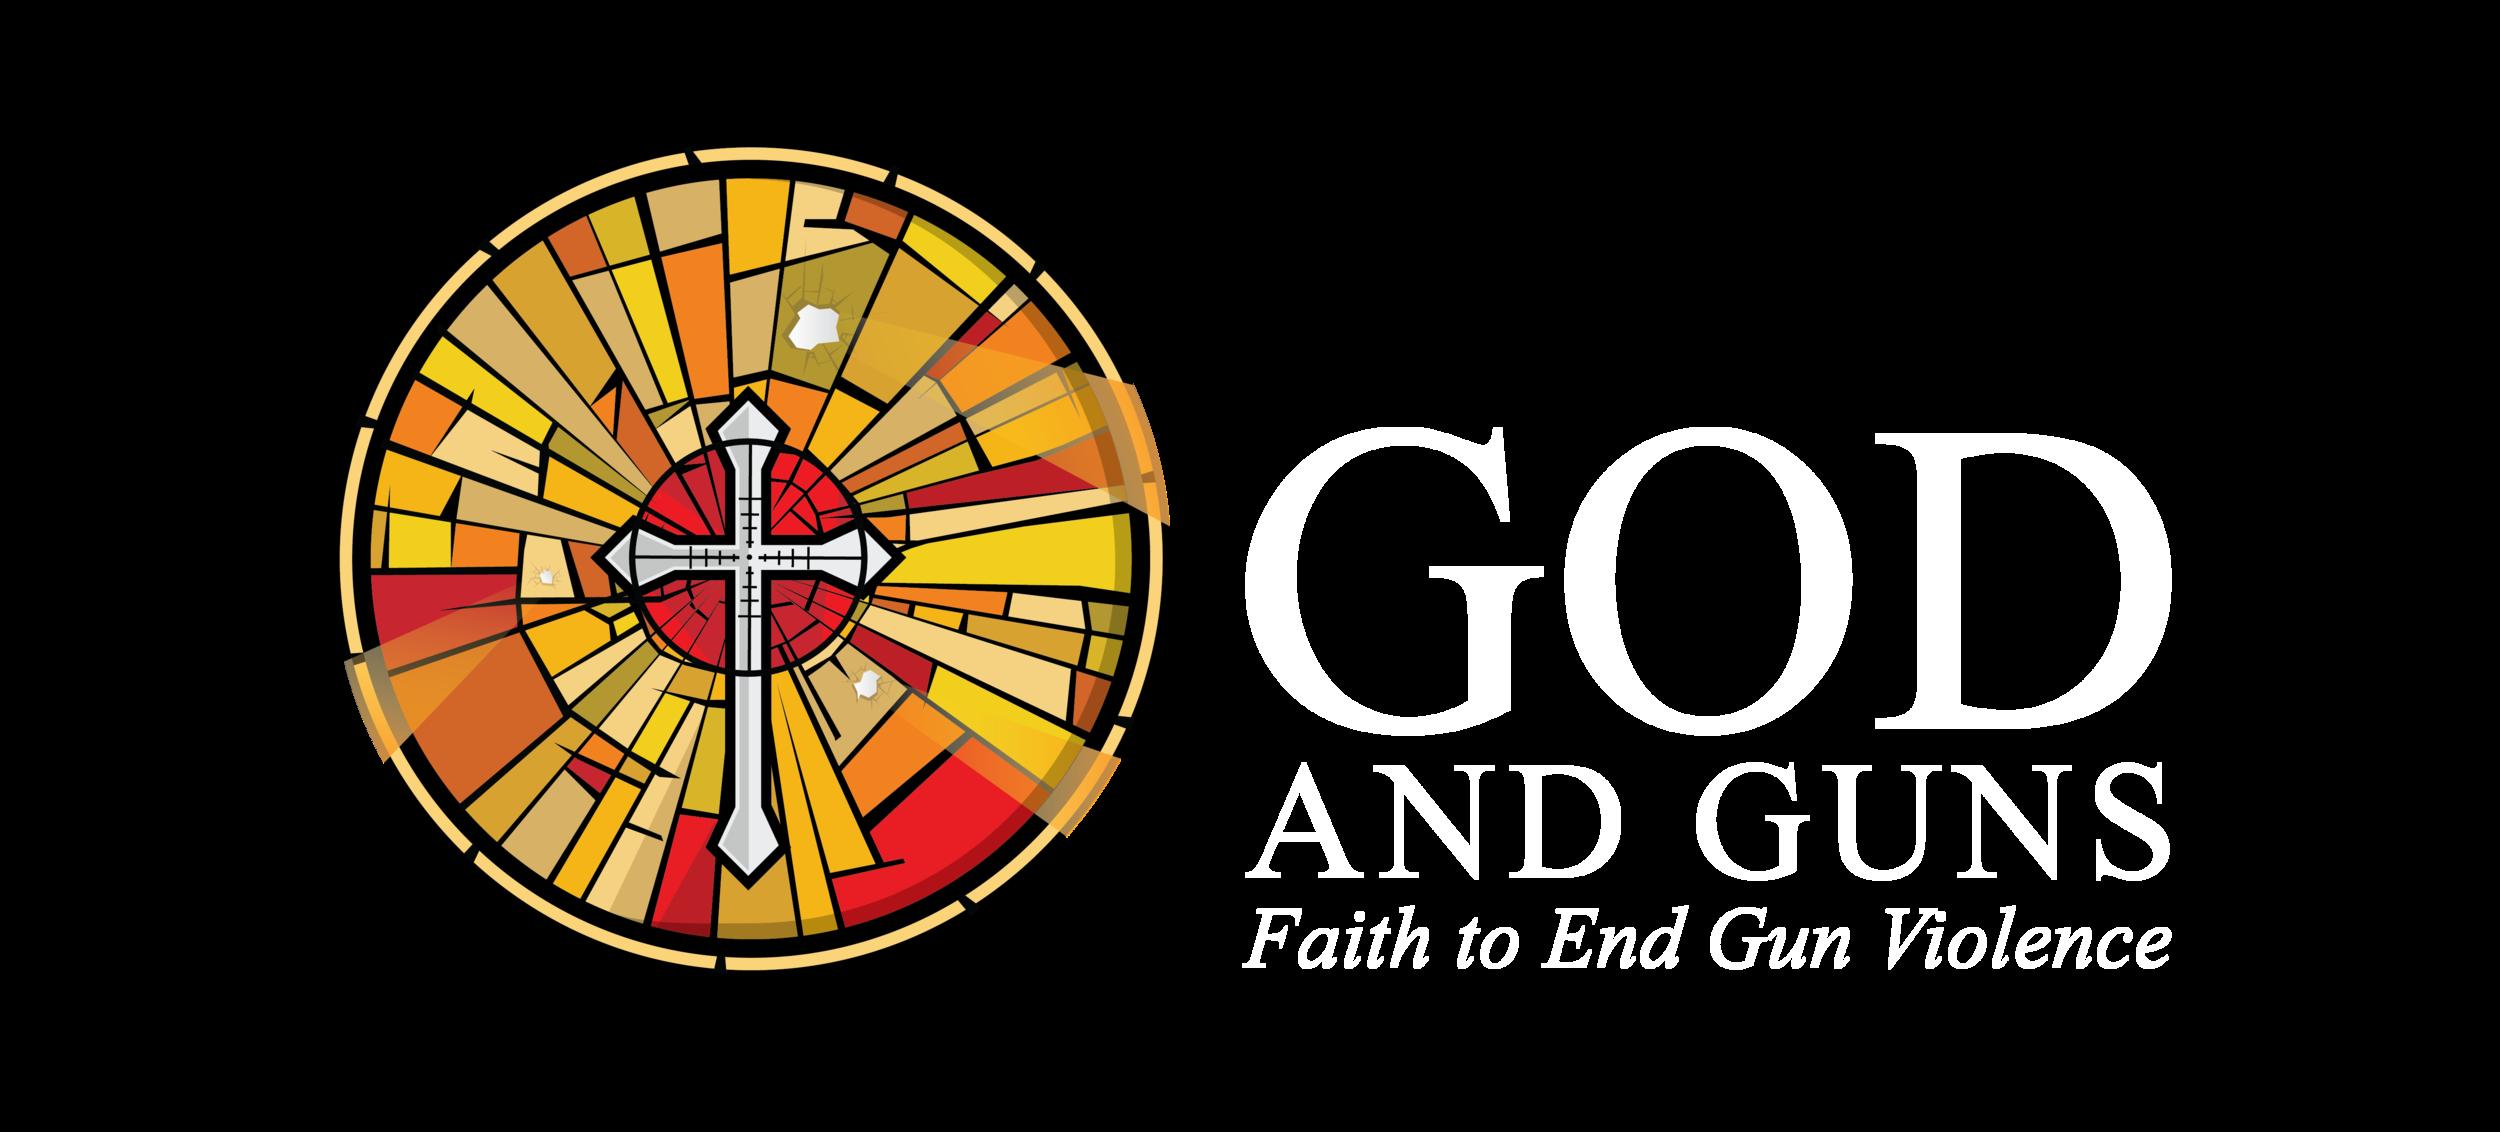 God and guns Final 2.png